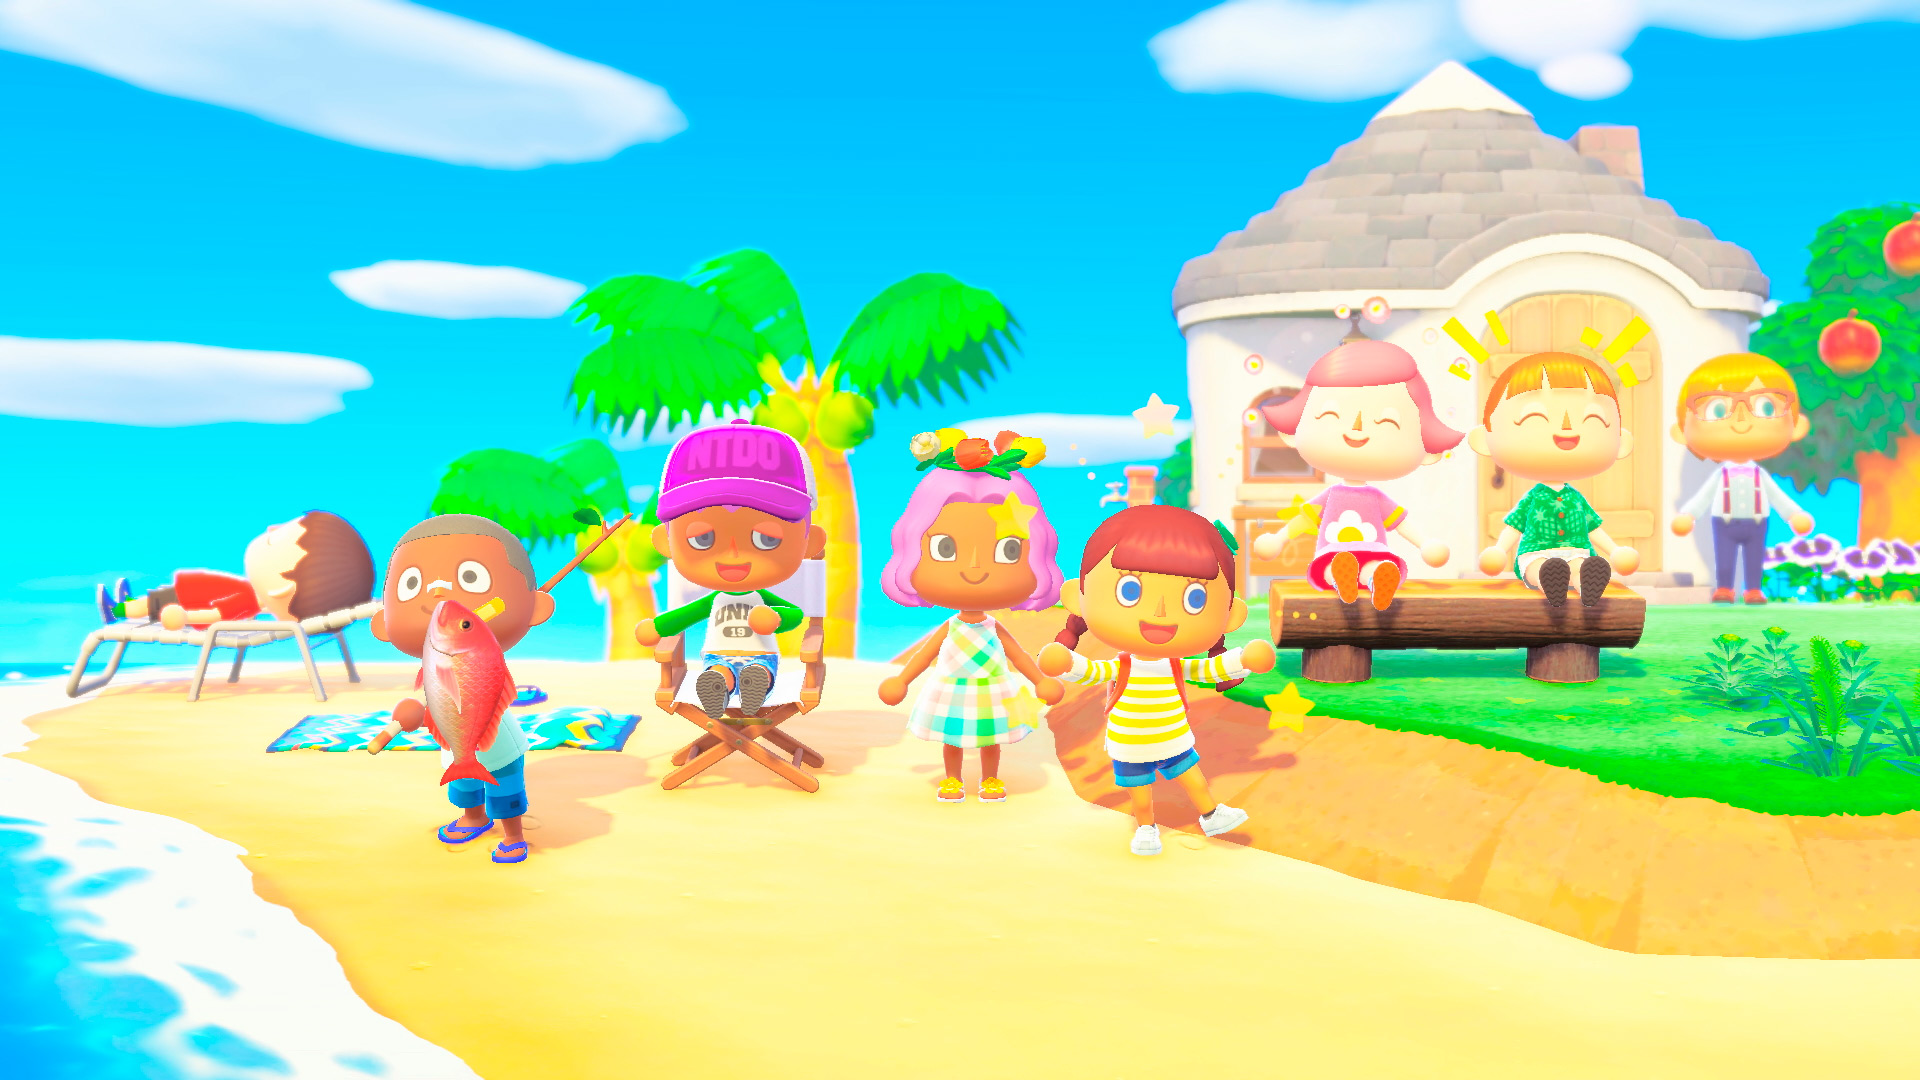 Animal Crossing: New Horizons datamine alleges upcoming bug spawn nerfs